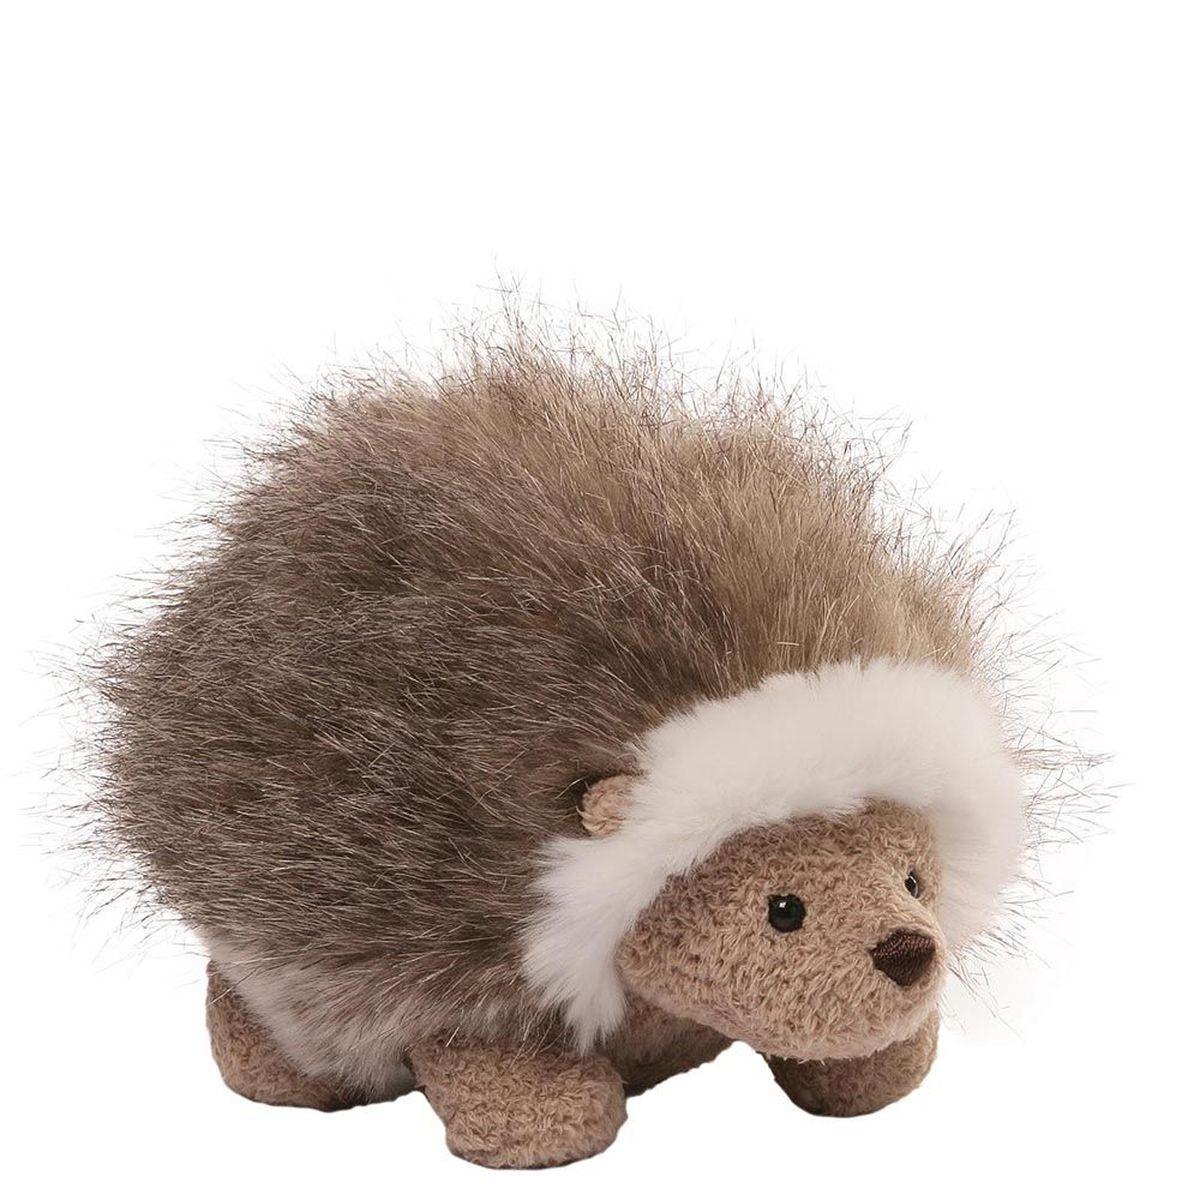 Gund Мягкая игрушка Oliver Hedgehog 12,5 см gund мягкая игрушка perry bear 40 5 см